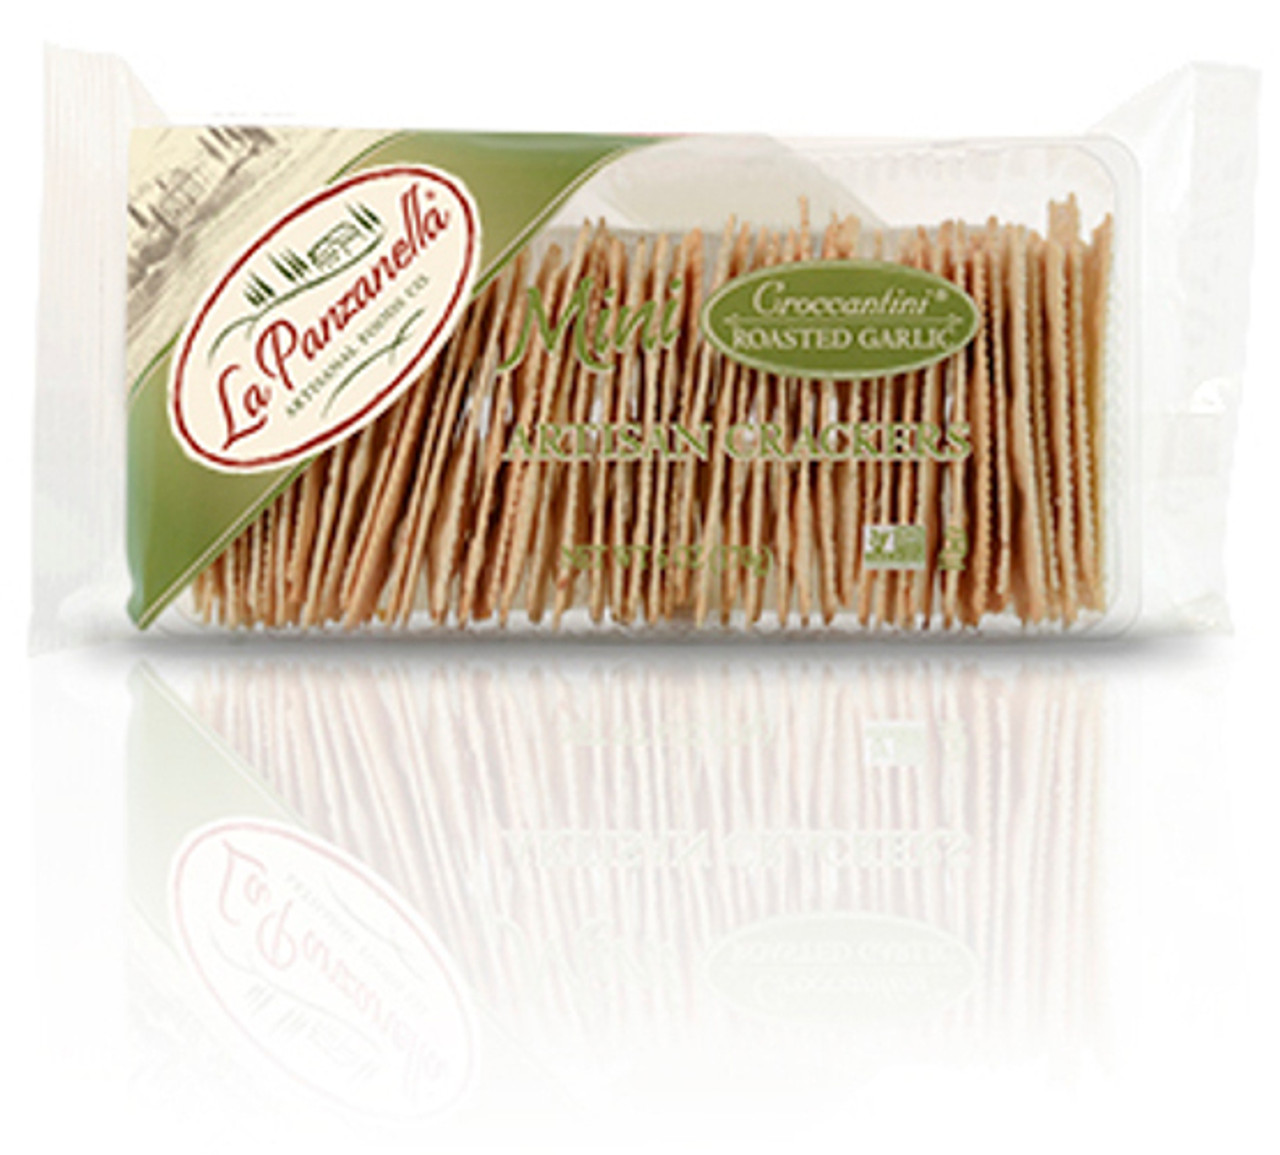 La Panzanella Roasted Garlic